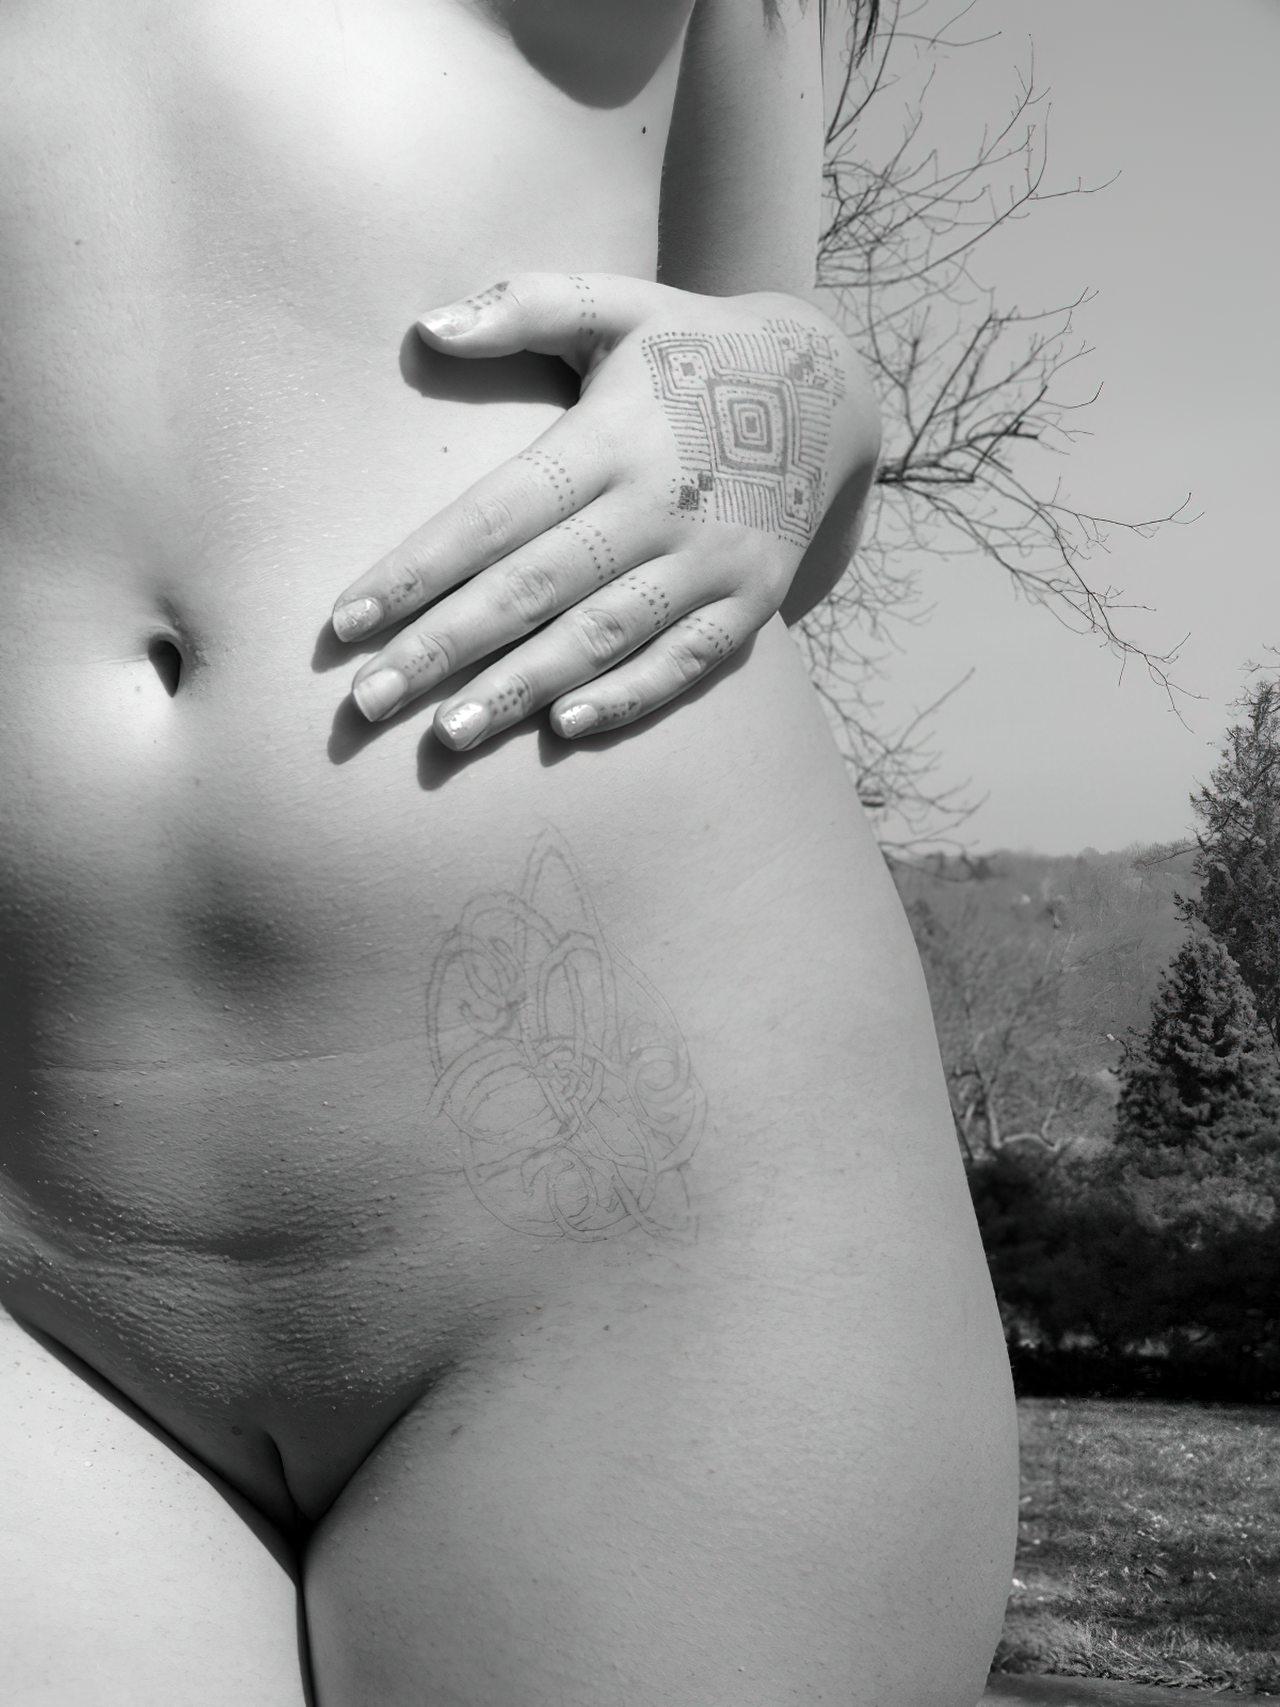 Sensualidade a Preto e Branco (4)